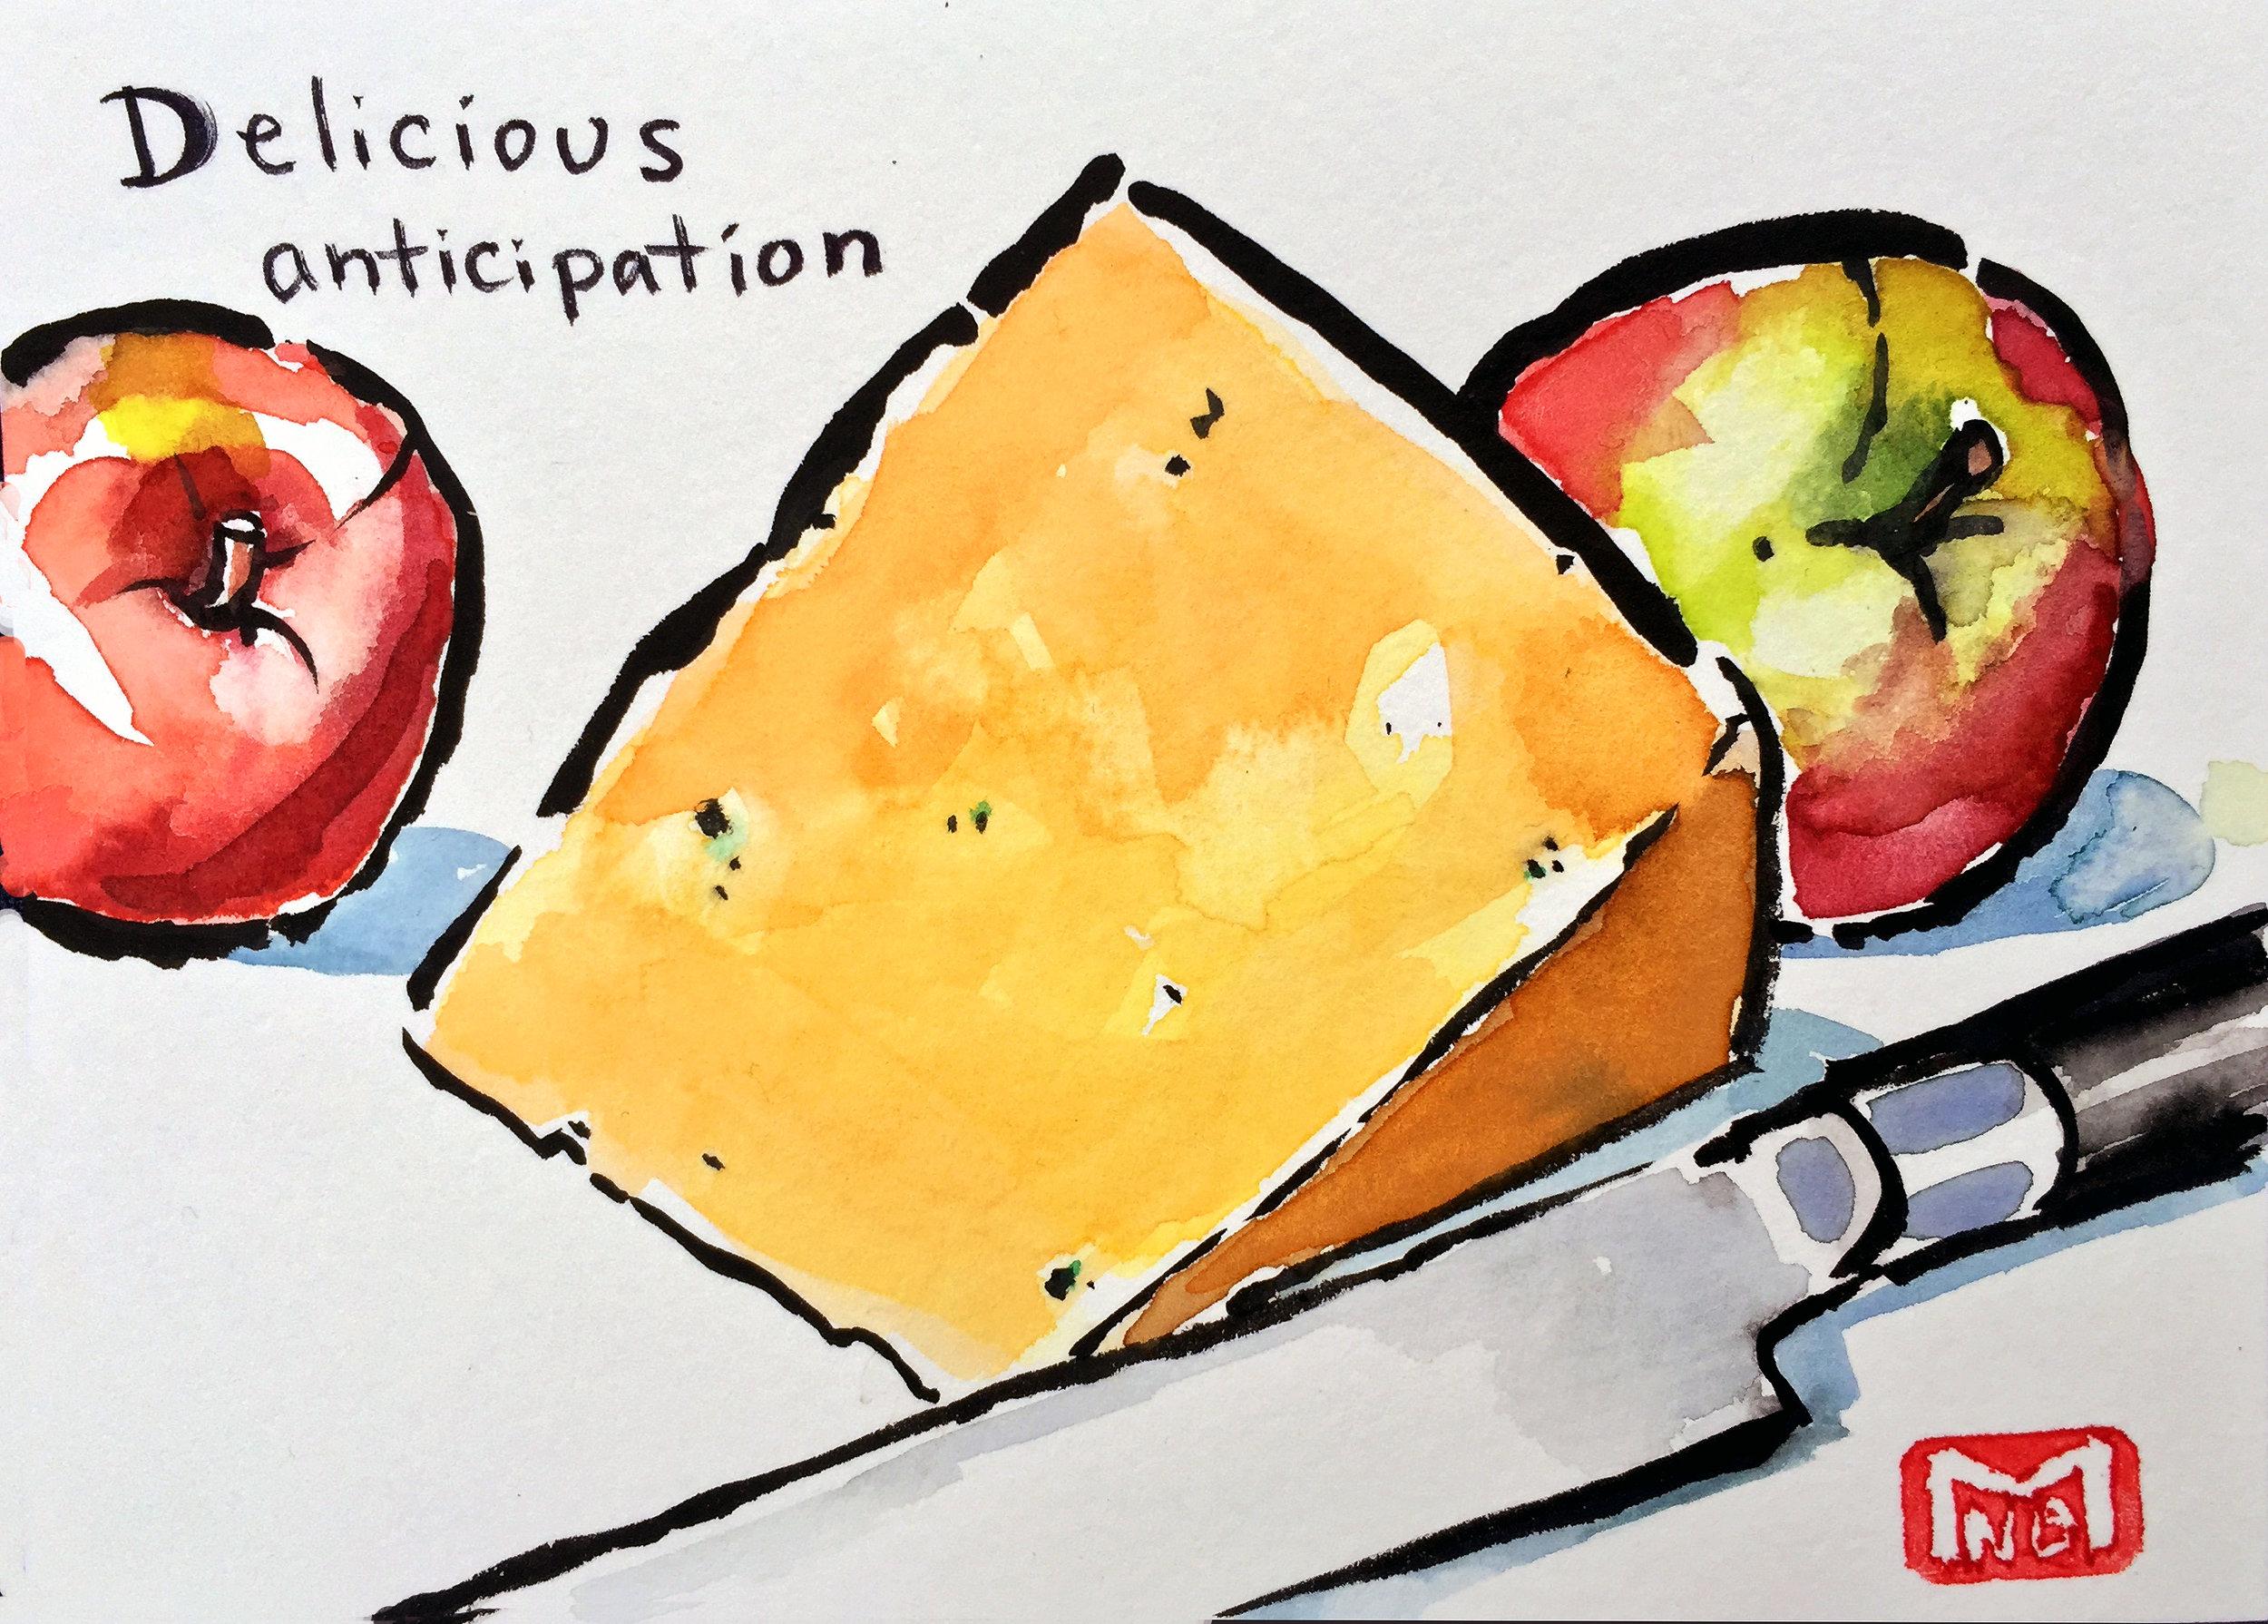 cheeseapples.jpg